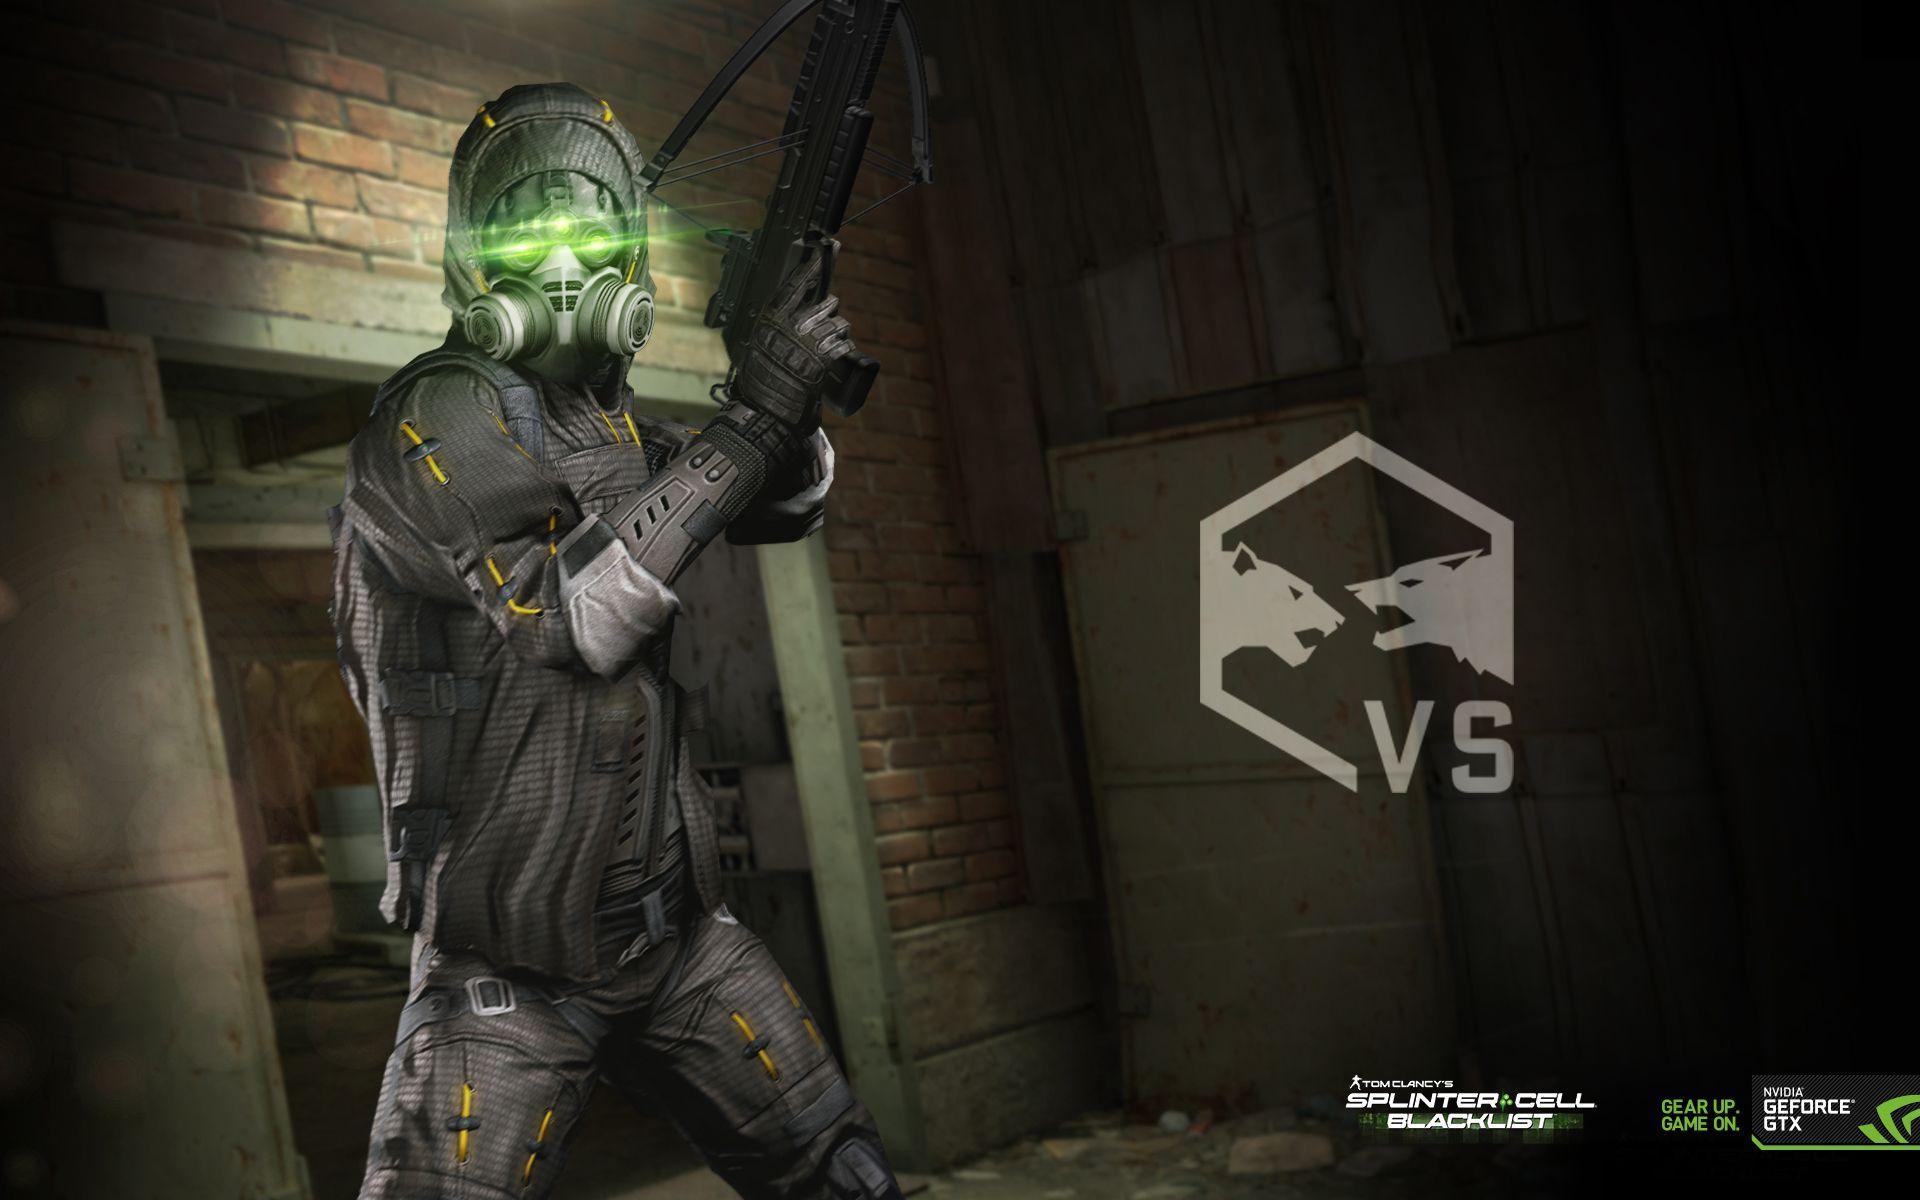 بازی Splinter Cell Blacklist